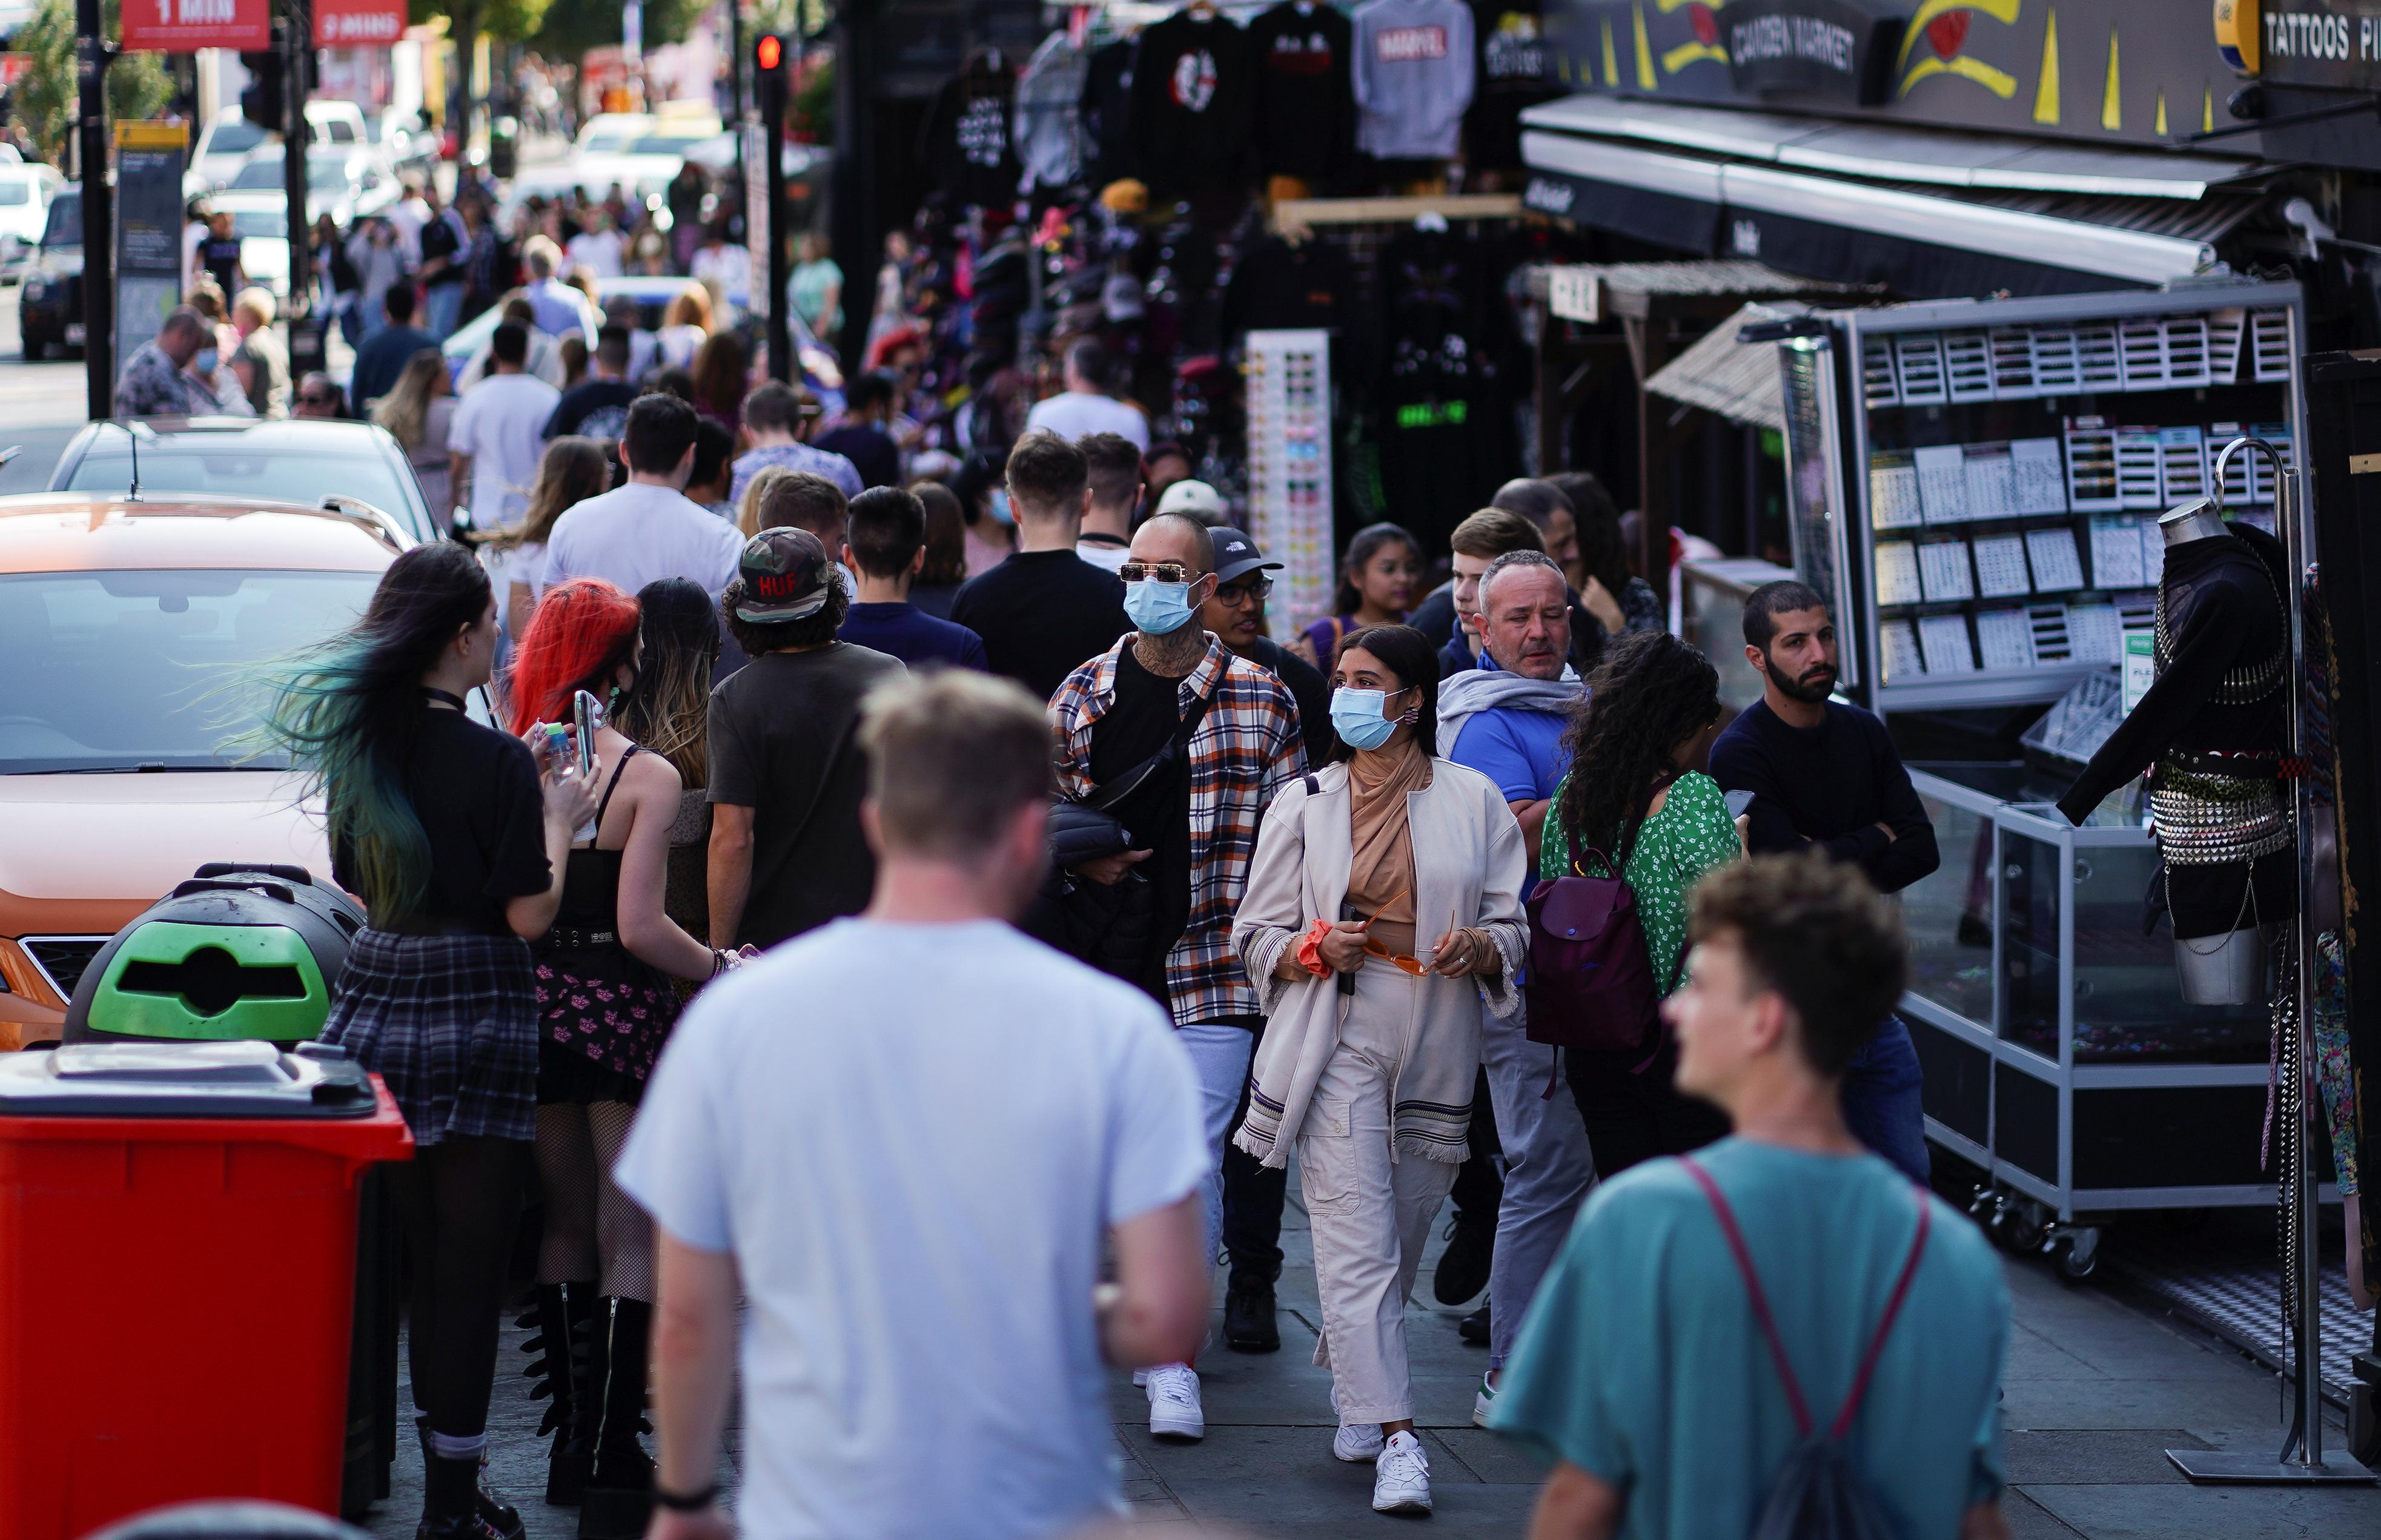 People walk along Camden High Street in London, Britain, September 19, 2020. REUTERS/Henry Nicholls